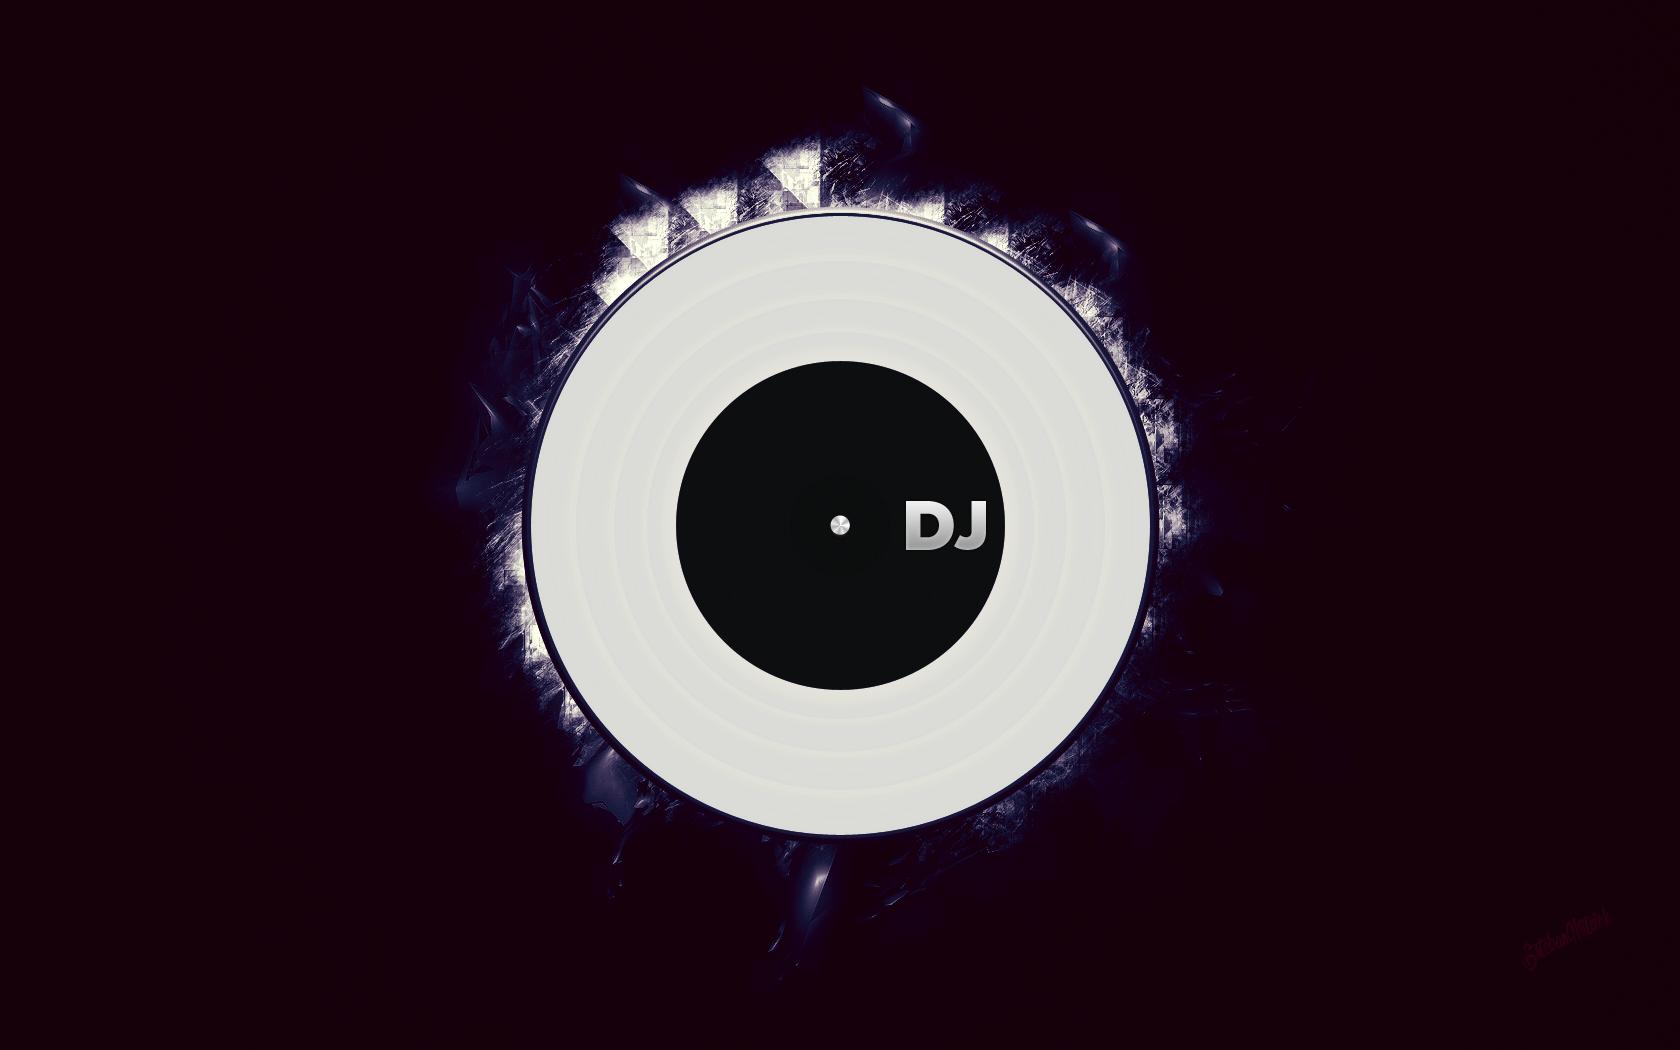 Alfa img - Showing > Logos De DJ Gratis